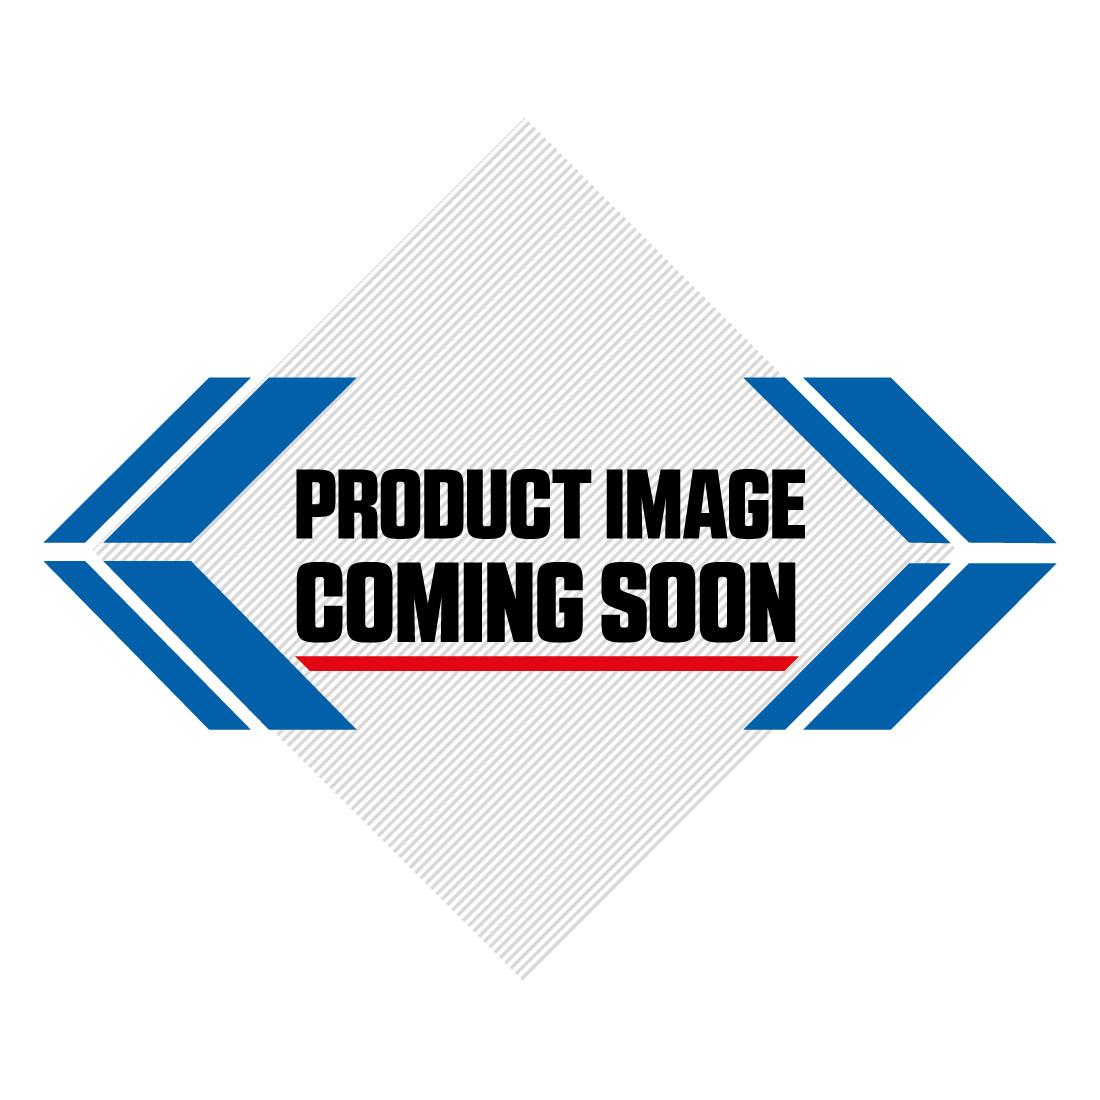 Kawasaki Restyled Plastic Kit KX 85 (2010) OEM Factory Image-1